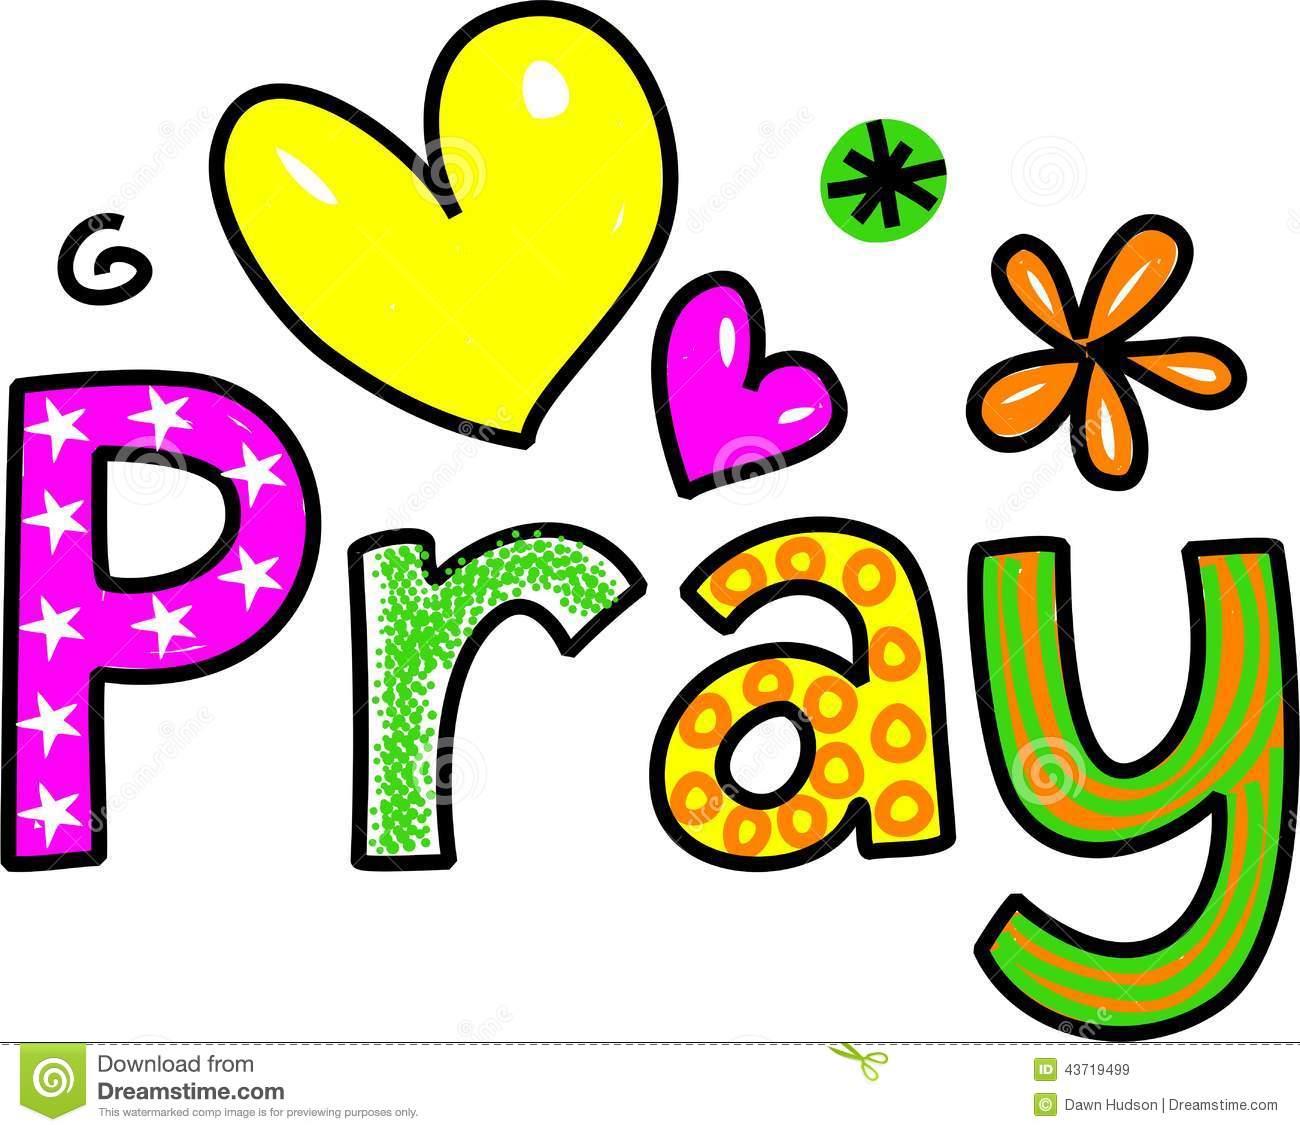 Prayers clipart #2